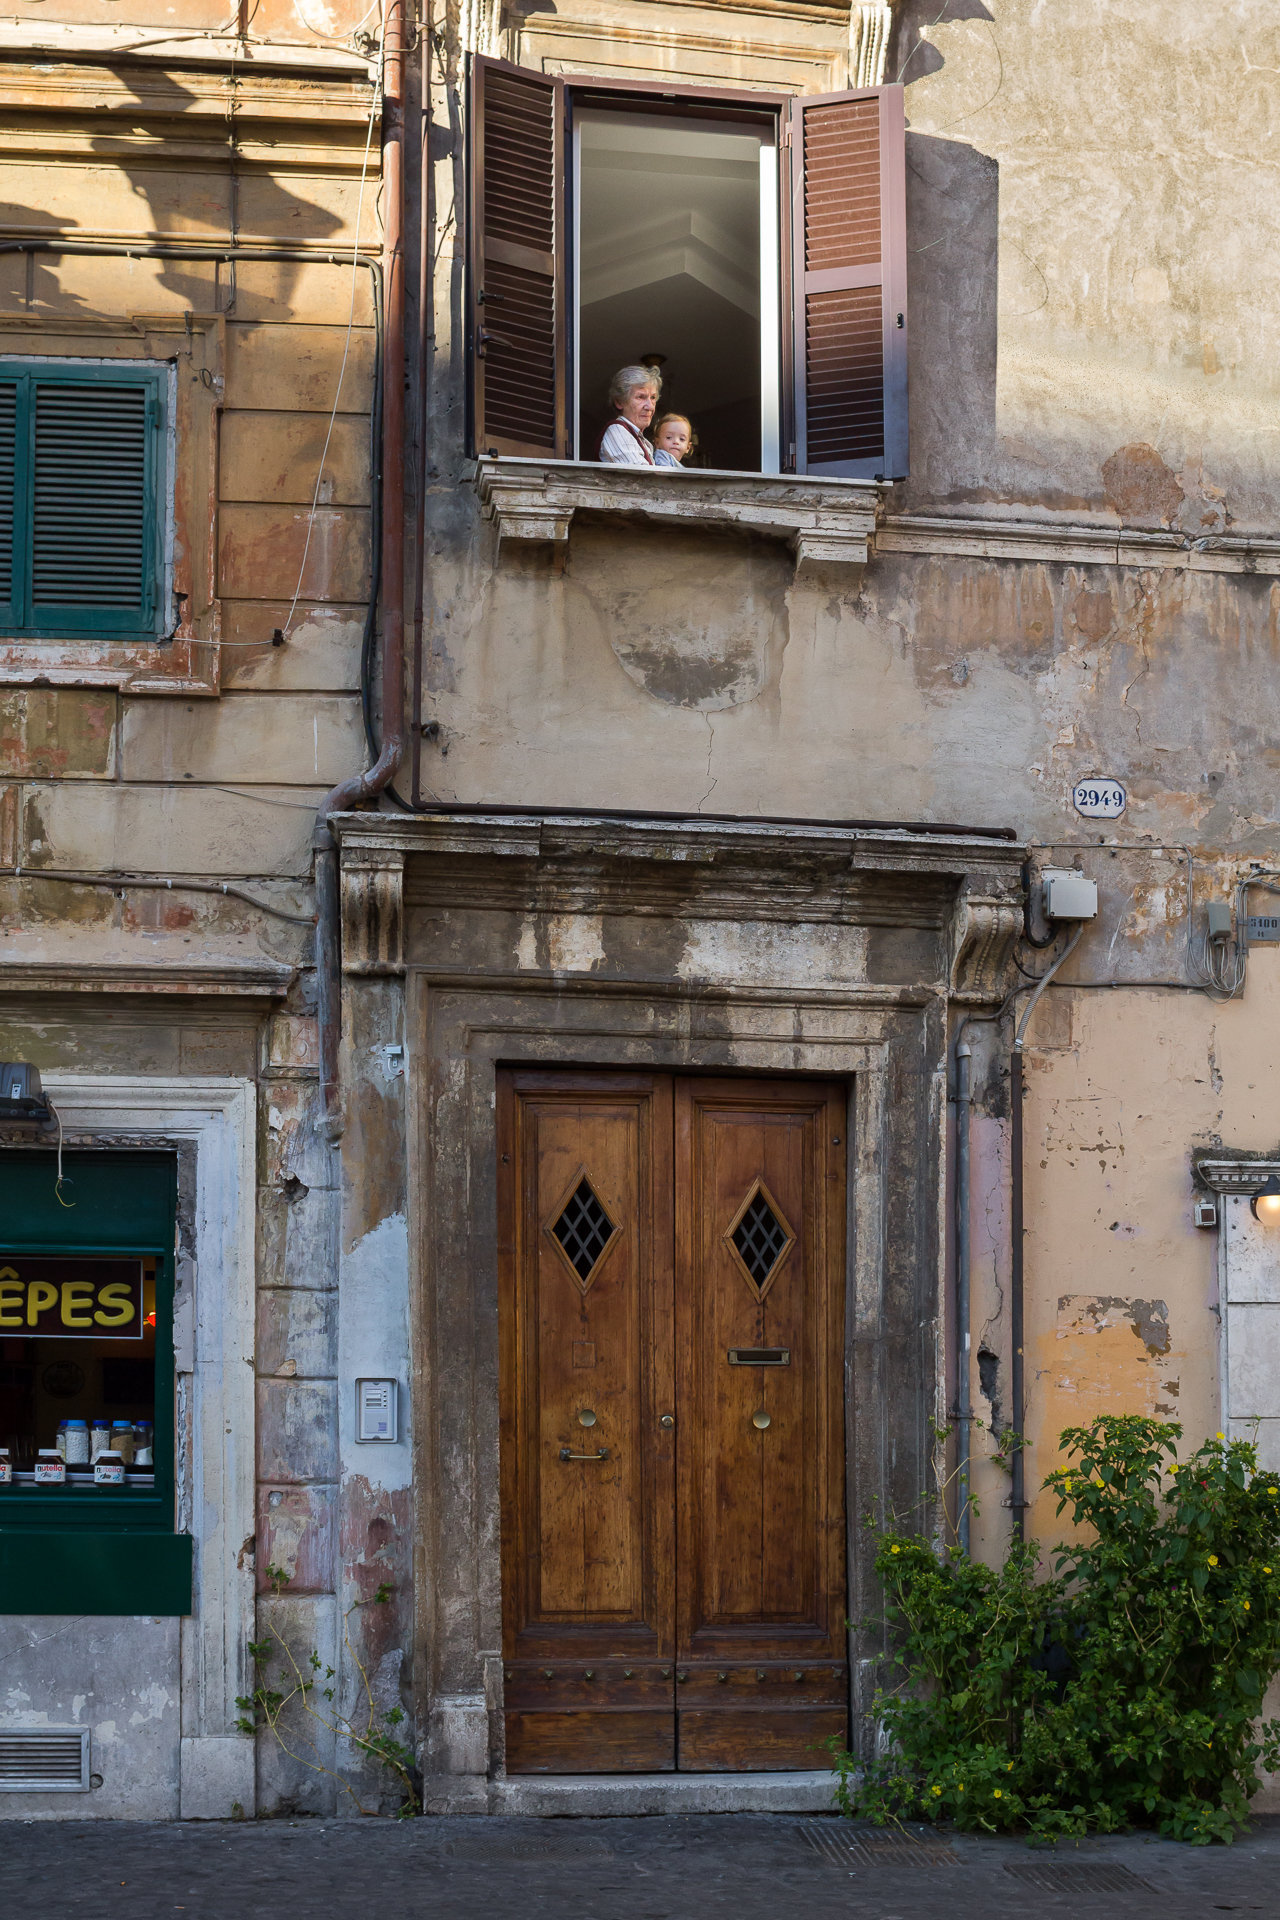 121017_Italy-1636.jpg